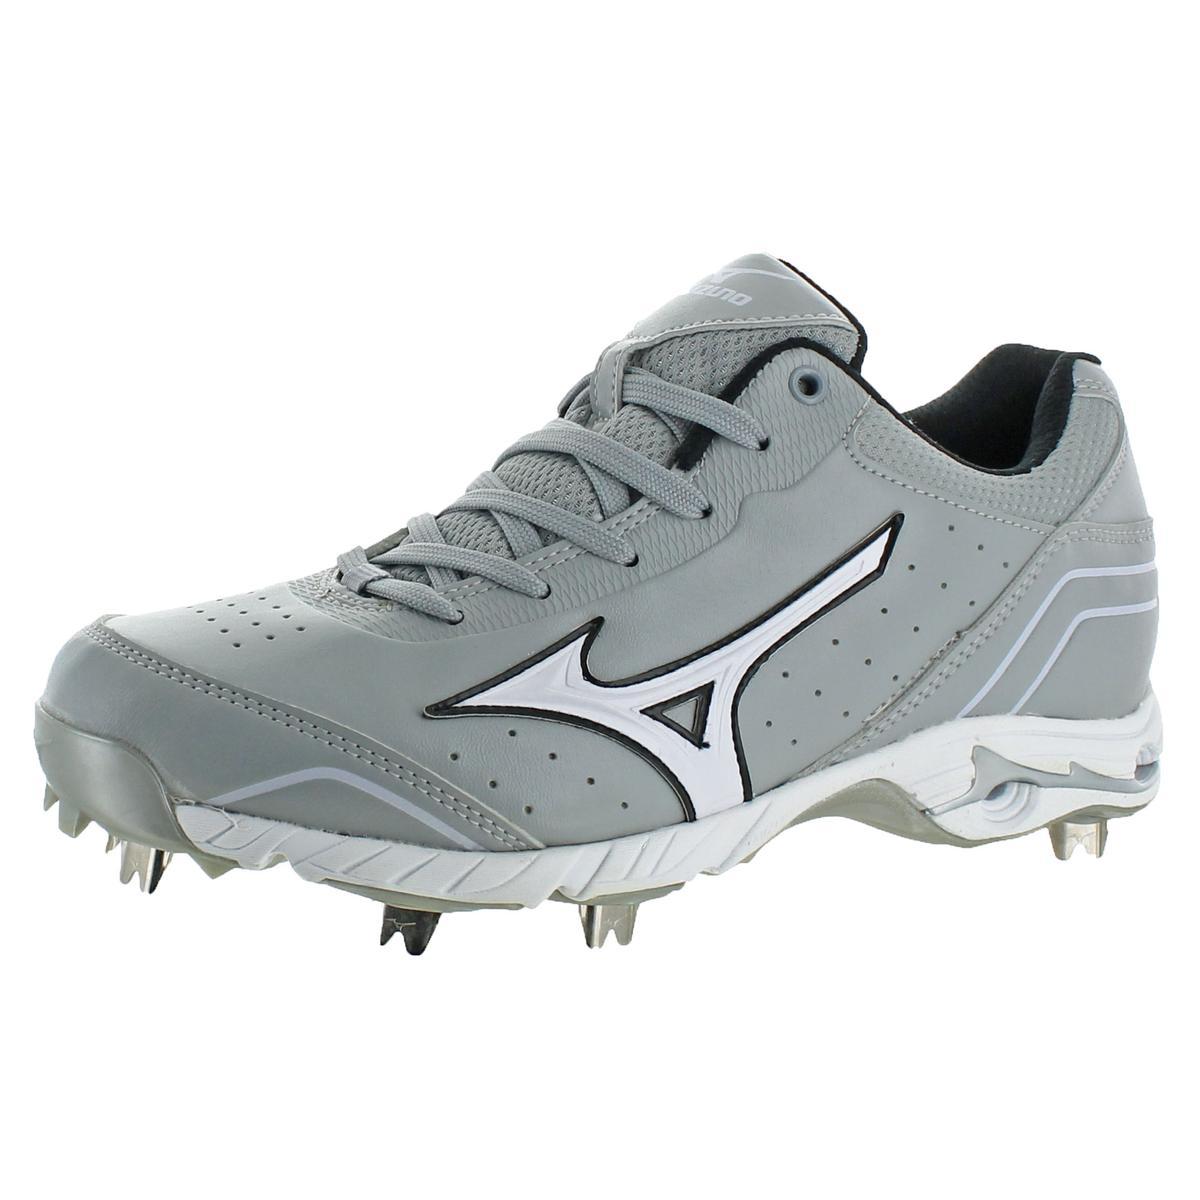 ab53a1e06860 mizuno classic shoes   ventes flash